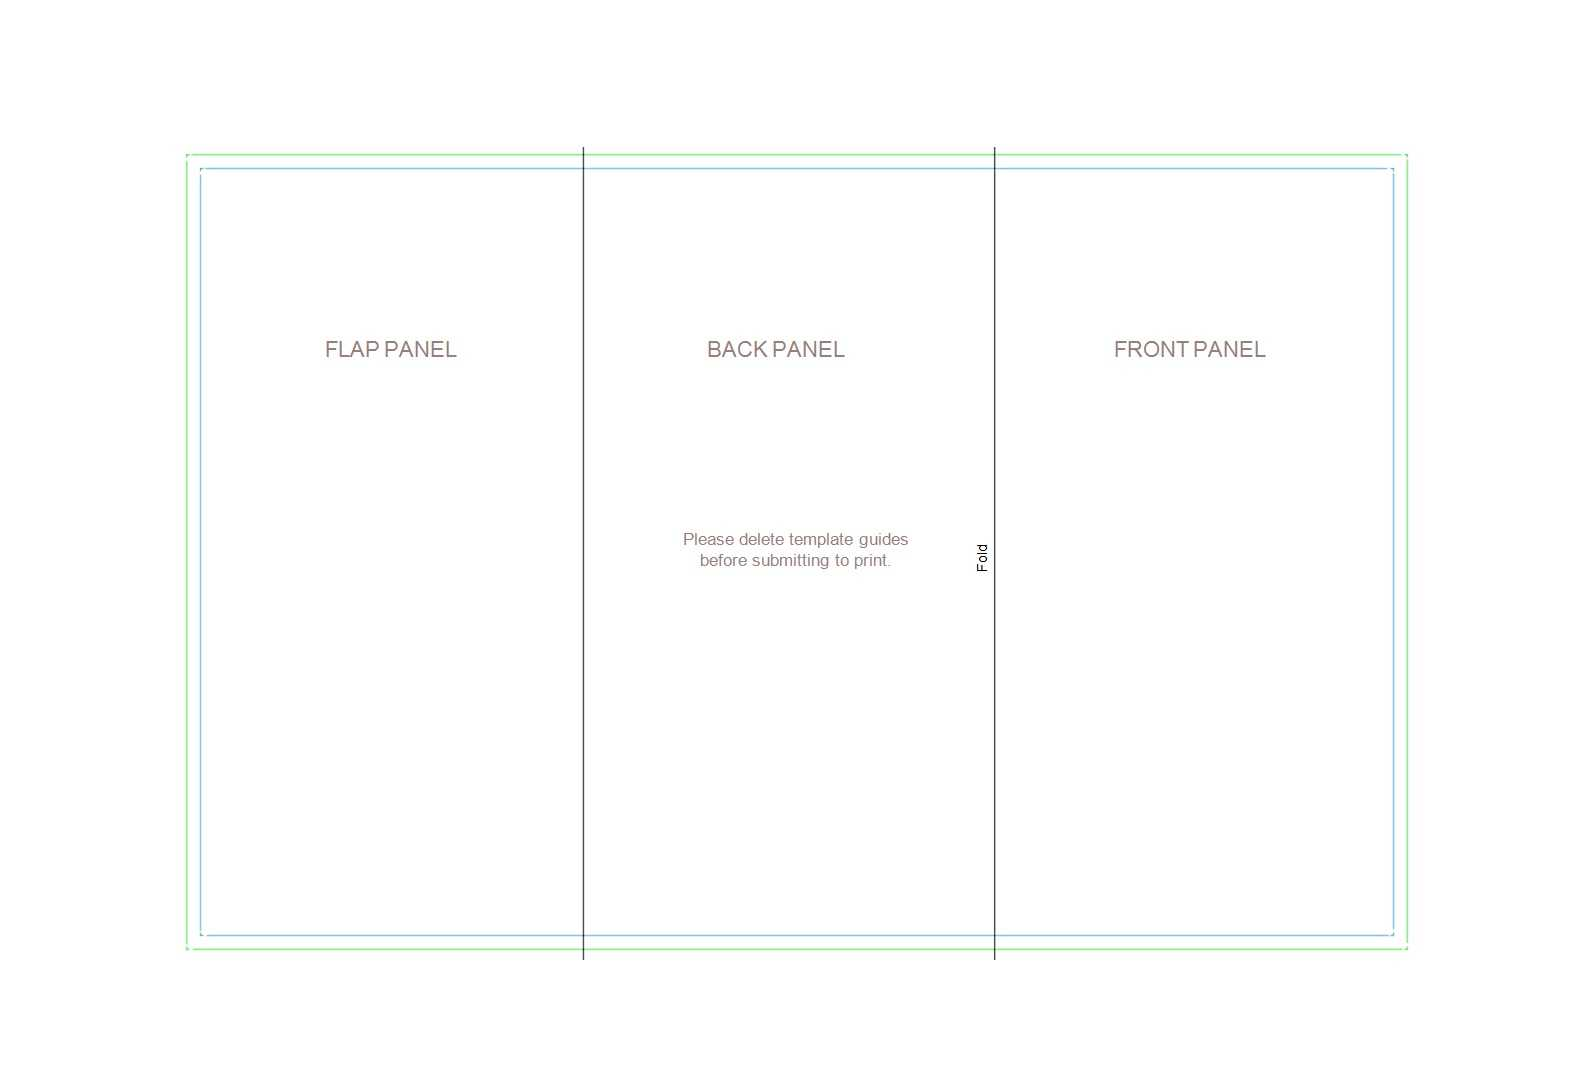 50 Free Pamphlet Templates [Word / Google Docs] ᐅ Template Lab in Brochure Template For Google Docs